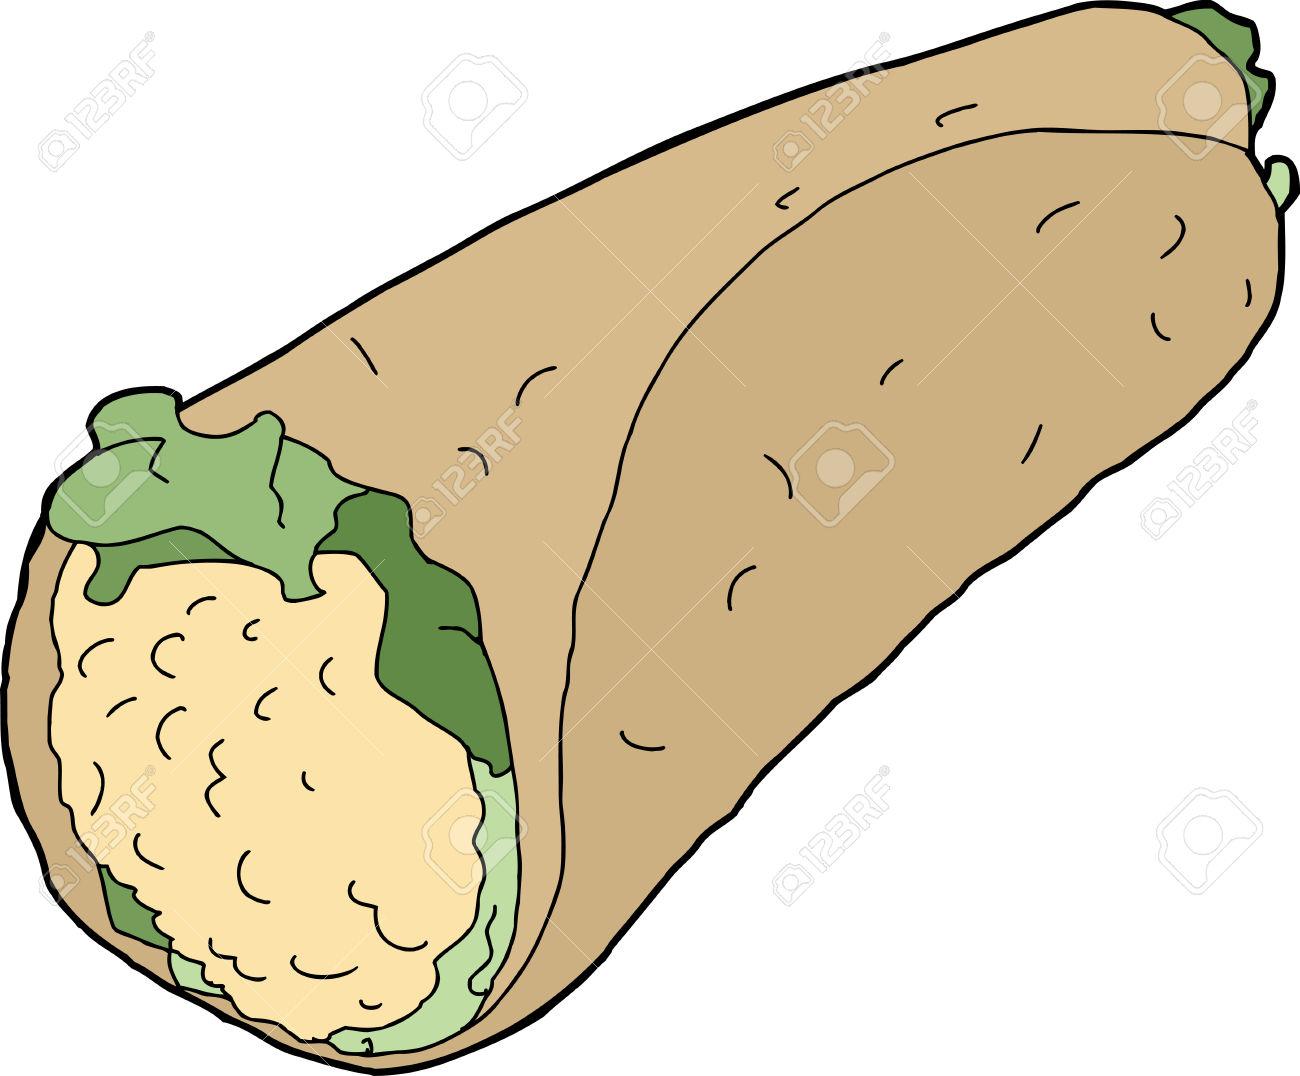 1300x1076 Tortilla Clipart Chicken Wrap